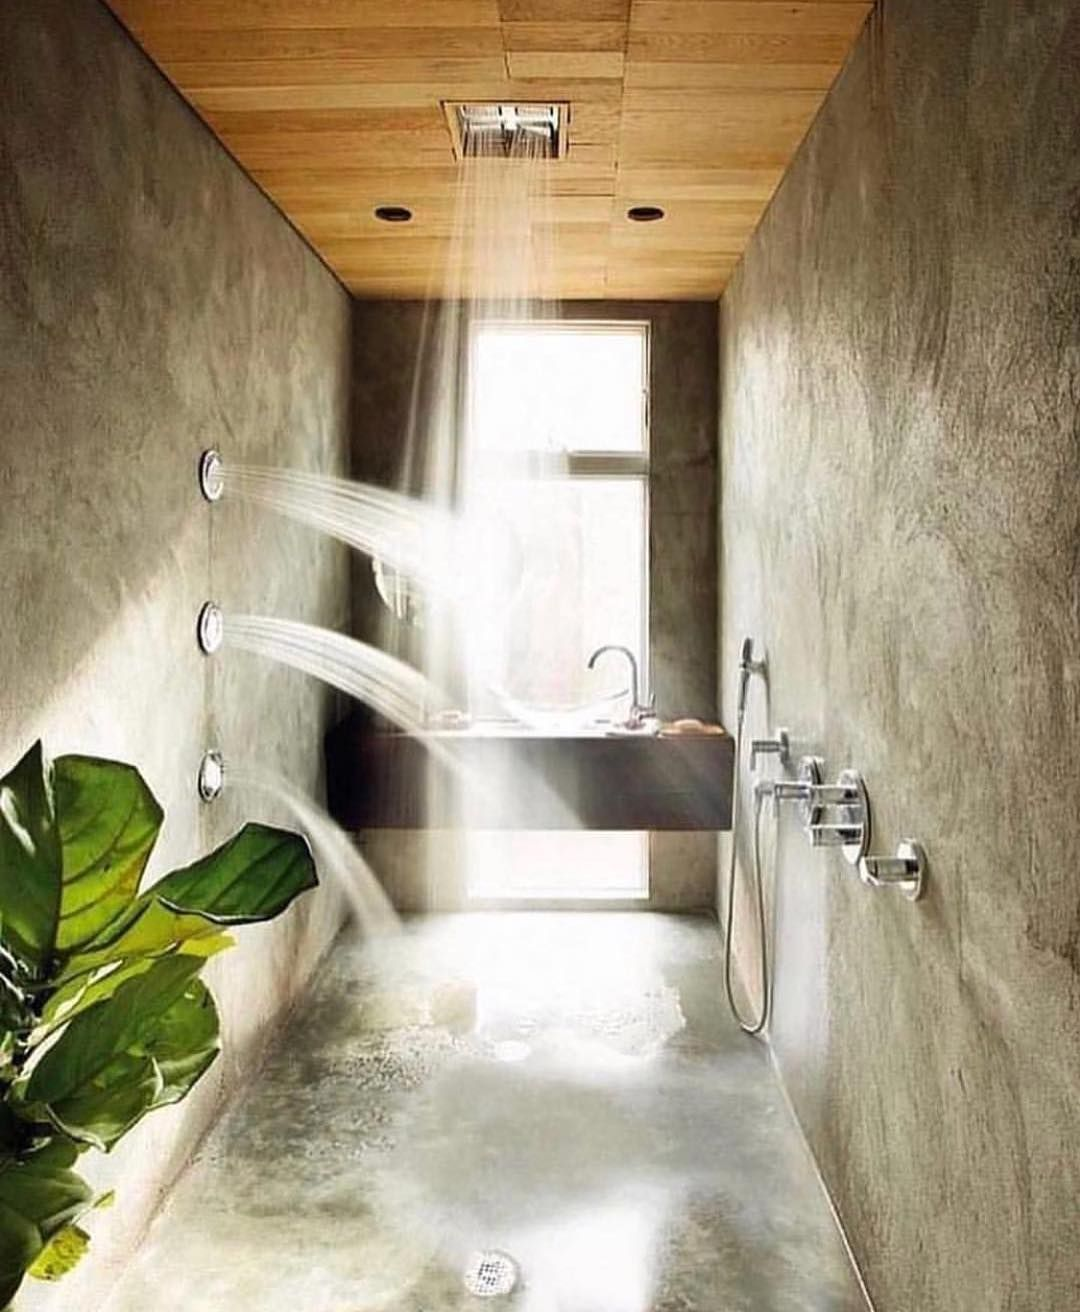 Trending 10 Beegcom New Trends Home Decor 2019 Best German Interior Design Blogs Instahome Homedecorsale Unique Bathroom Bathroom Design Minimalism Interior